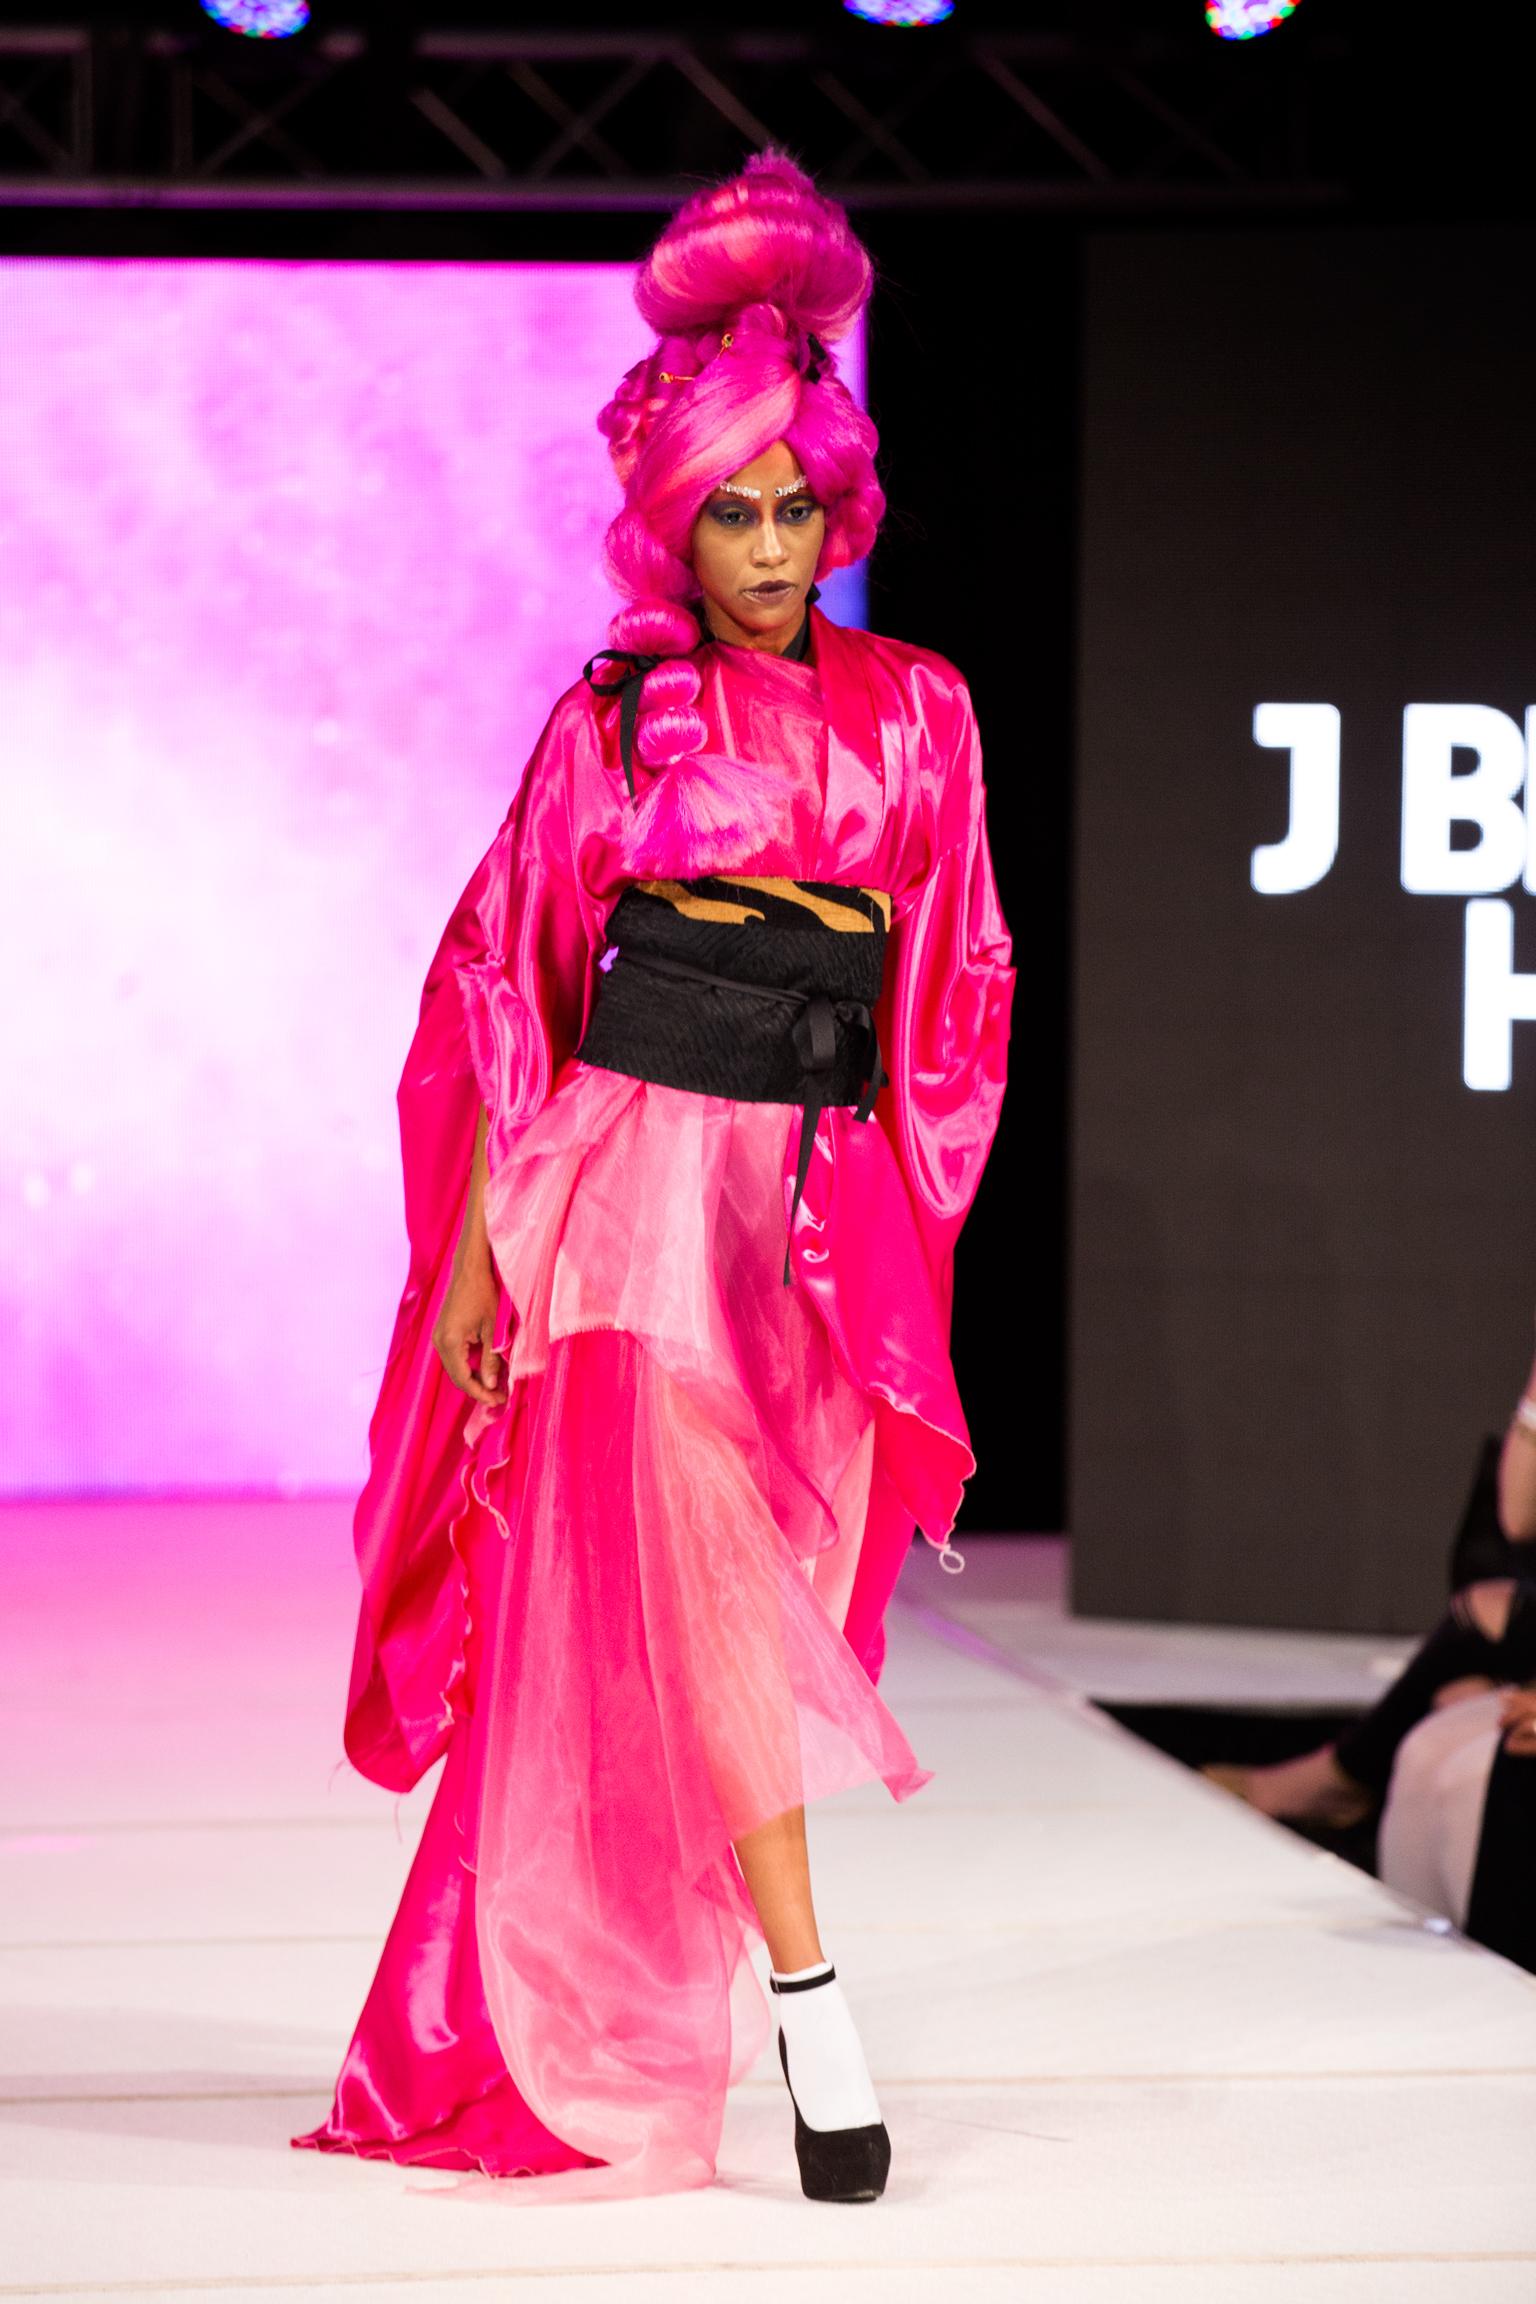 Denver Fashion Week Day 4  J Beverly Hills - 001.jpg